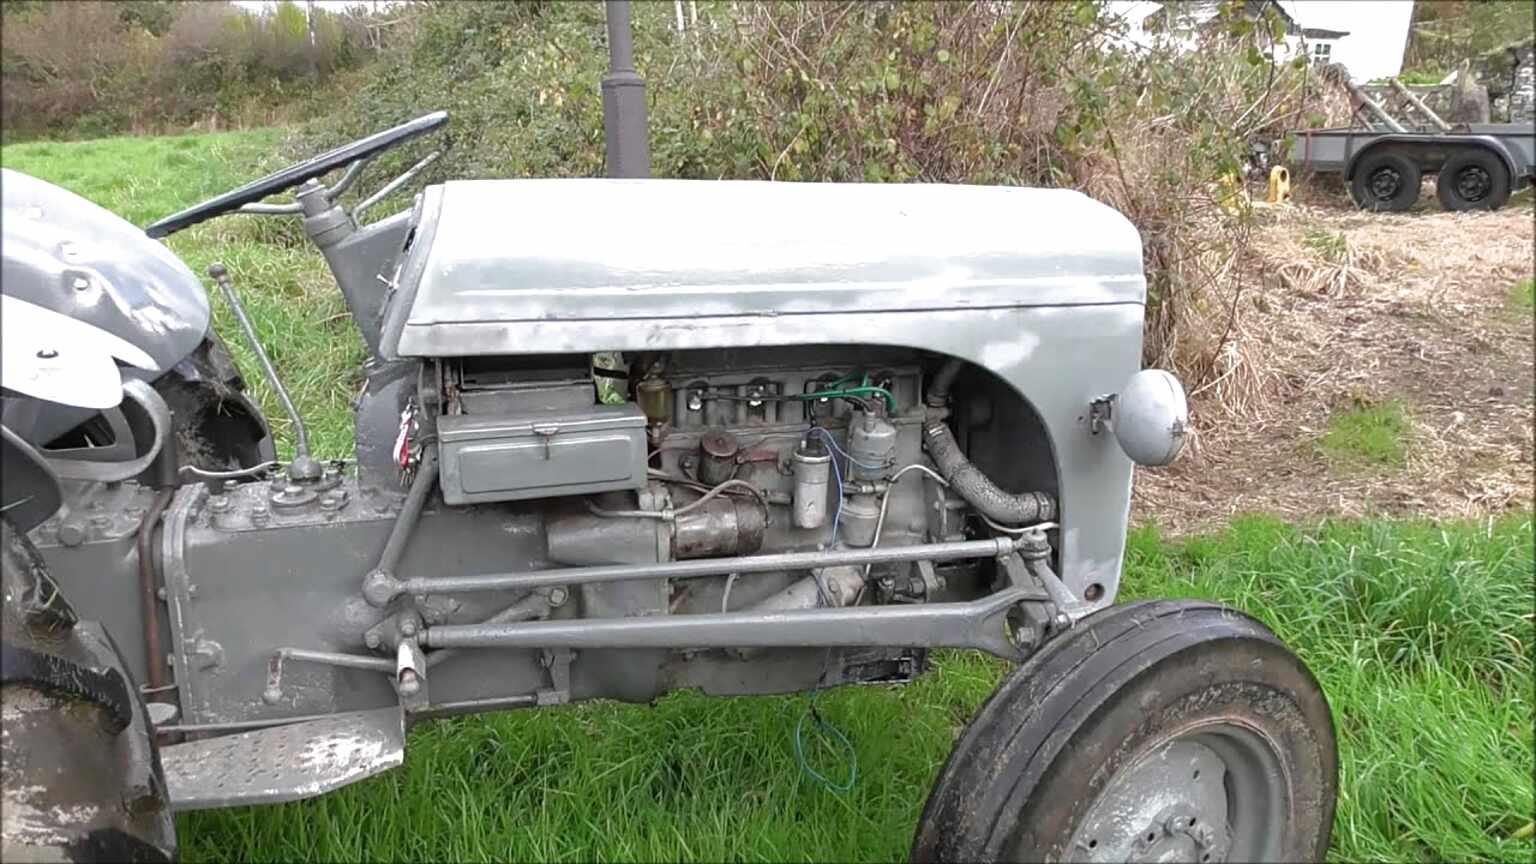 APUK 2x Bonnet Runner Rod fits Massey Ferguson FF30 TE 20 TE20 TEA20 TED20 TEF20 Tractor